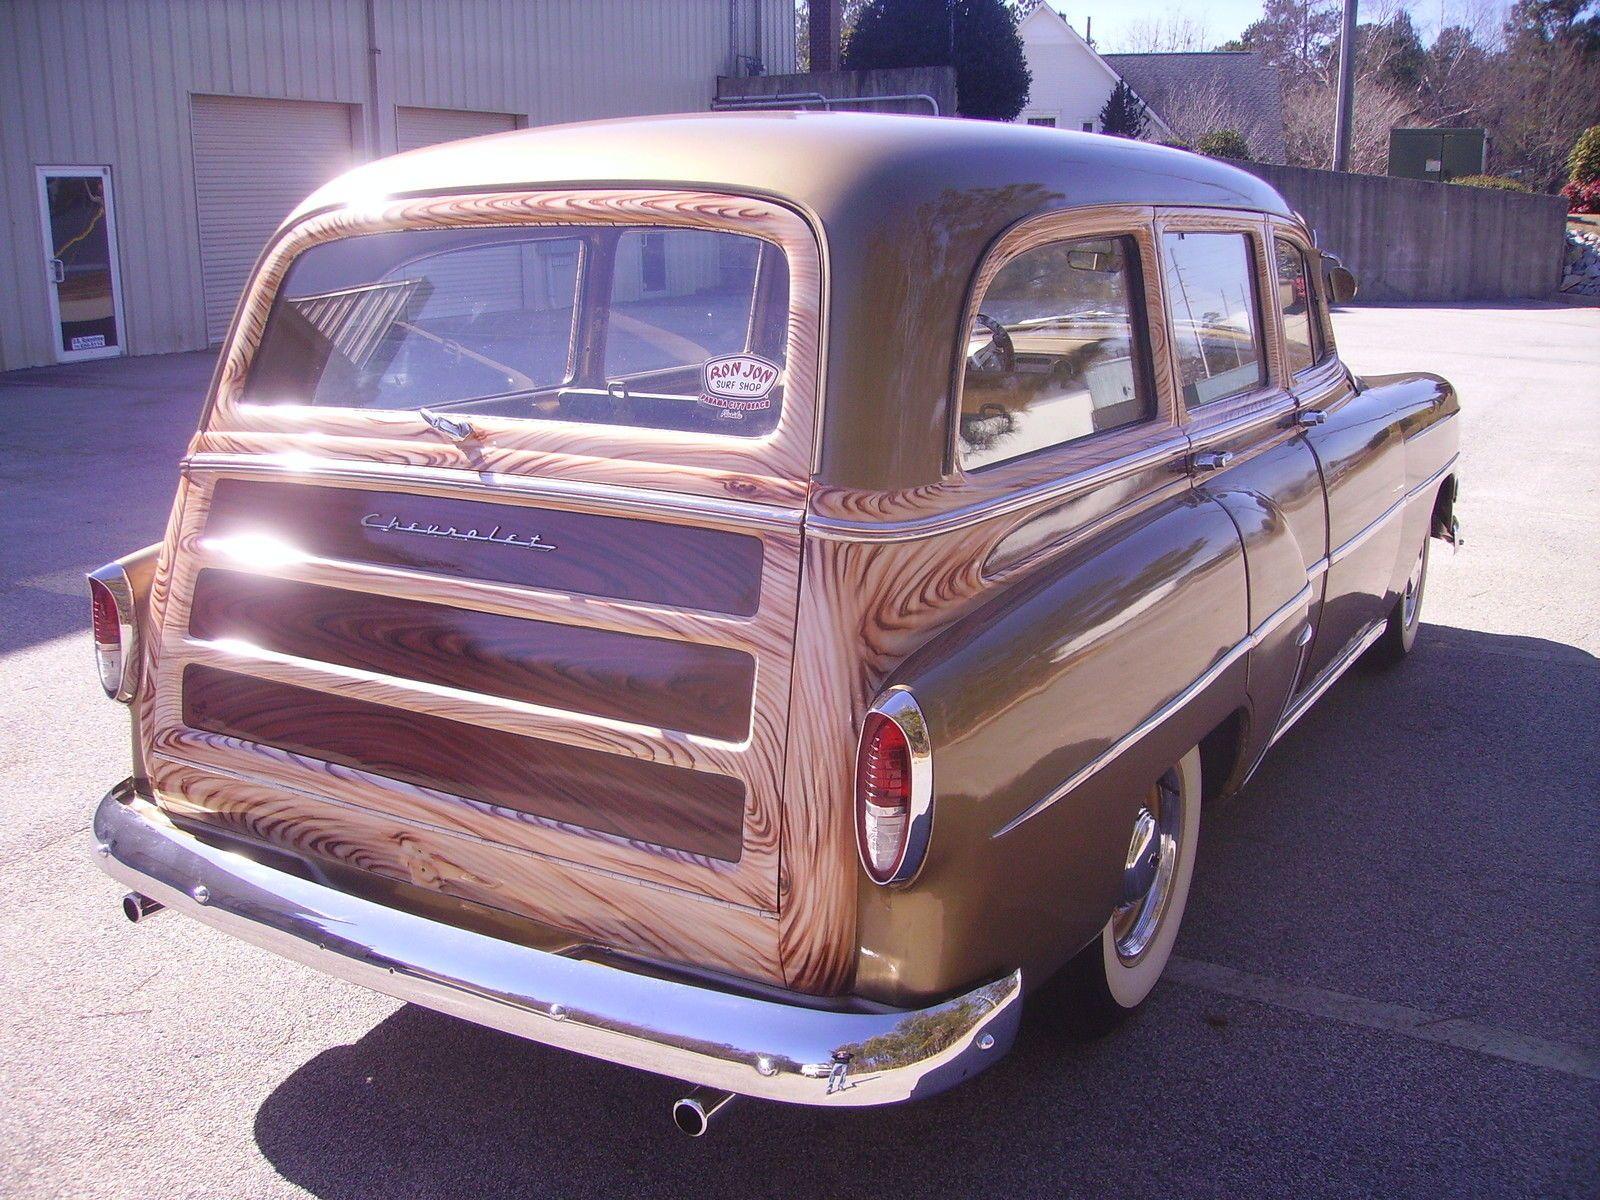 54 Chevrolet Bel Air 150 210 Tin Woody Wagon Chevrolet Bel Air